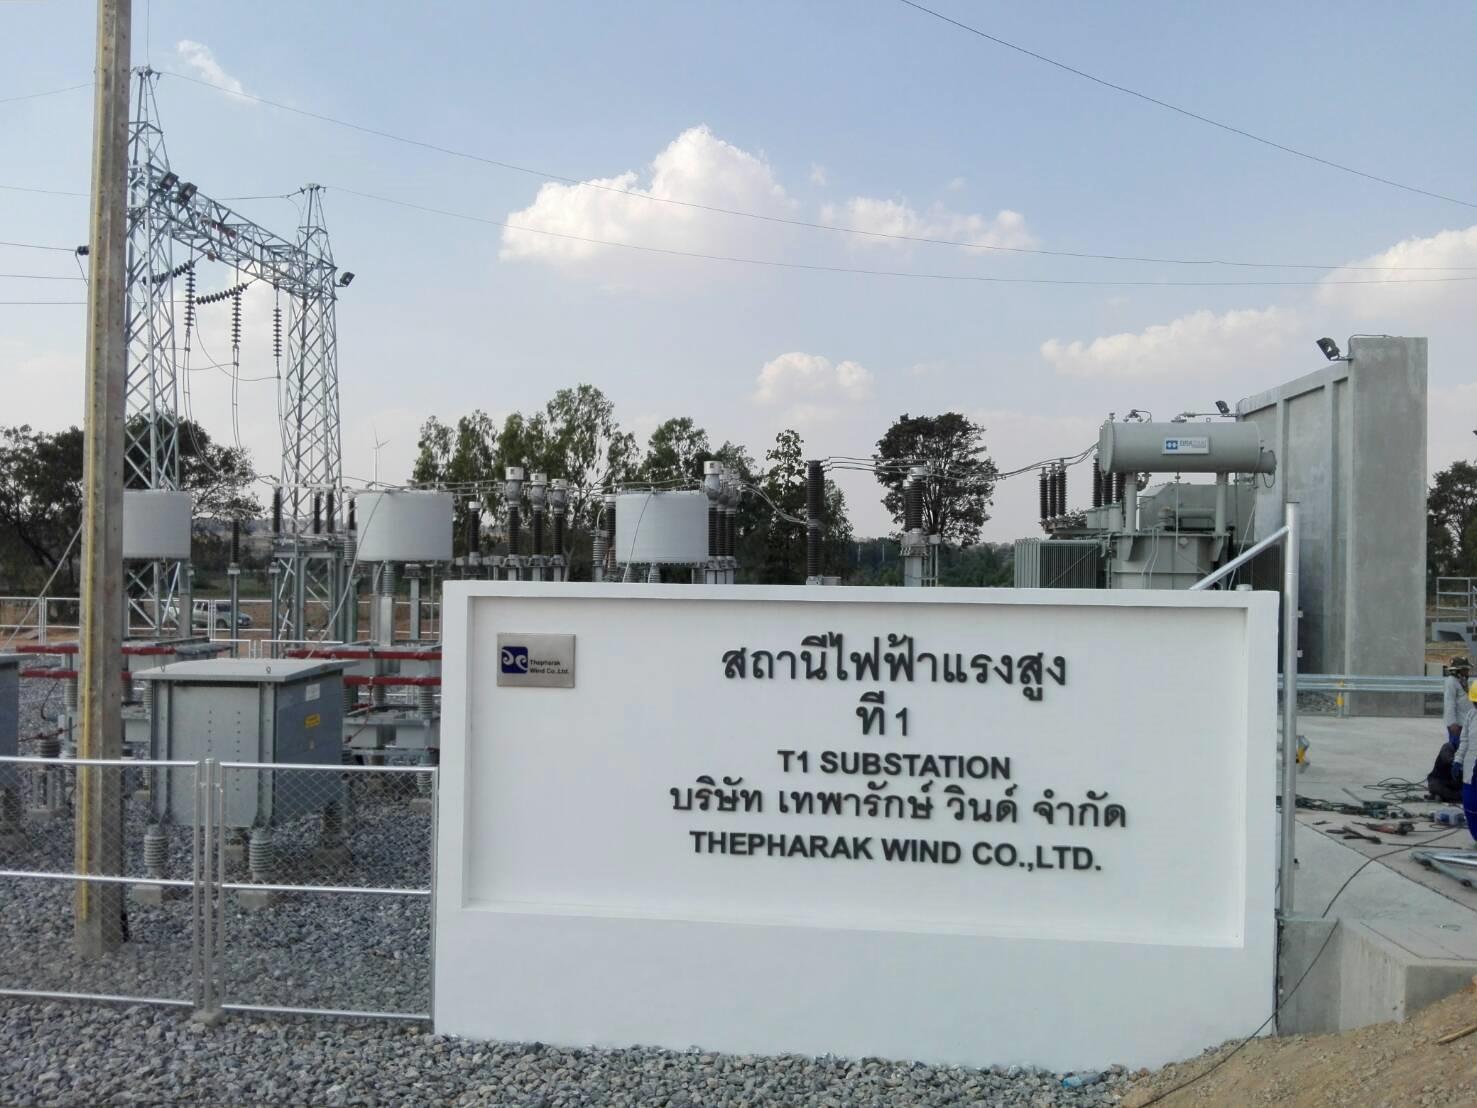 Substation  T1 จ.นครราชสีมา